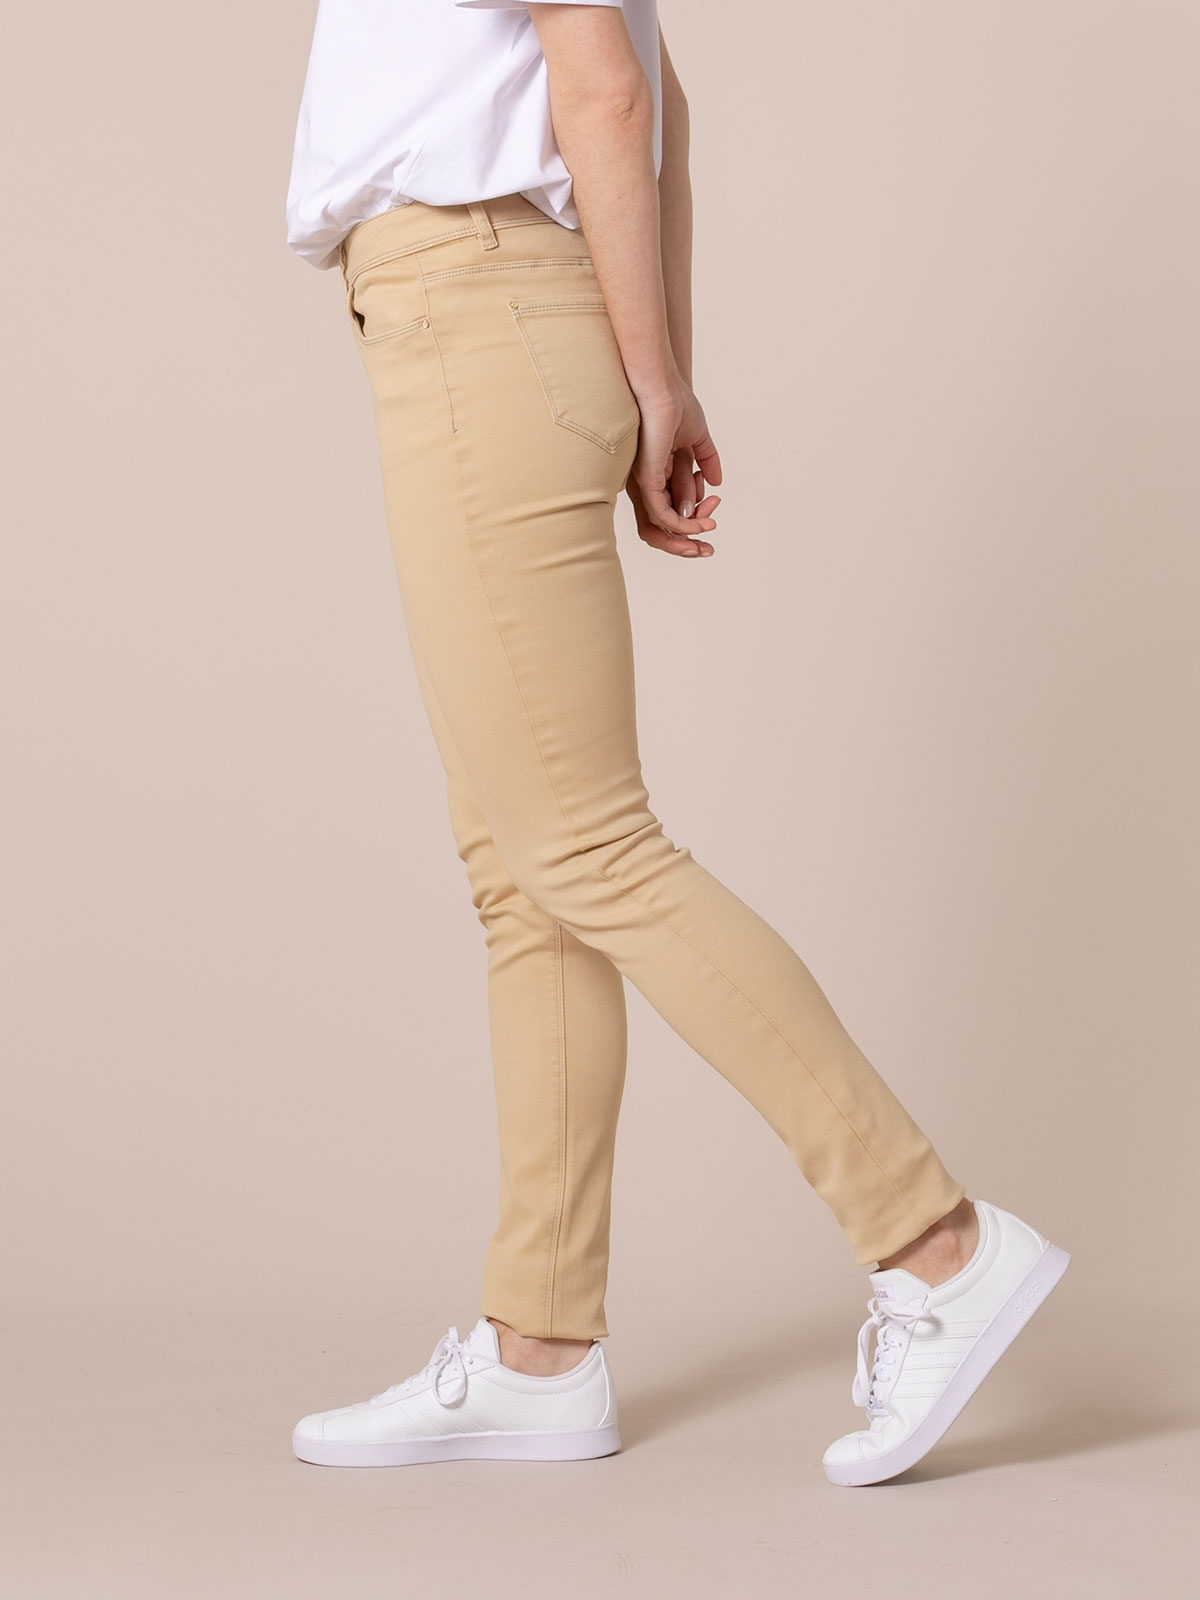 Pantalón mujer 5 bolsillos elastico Camel